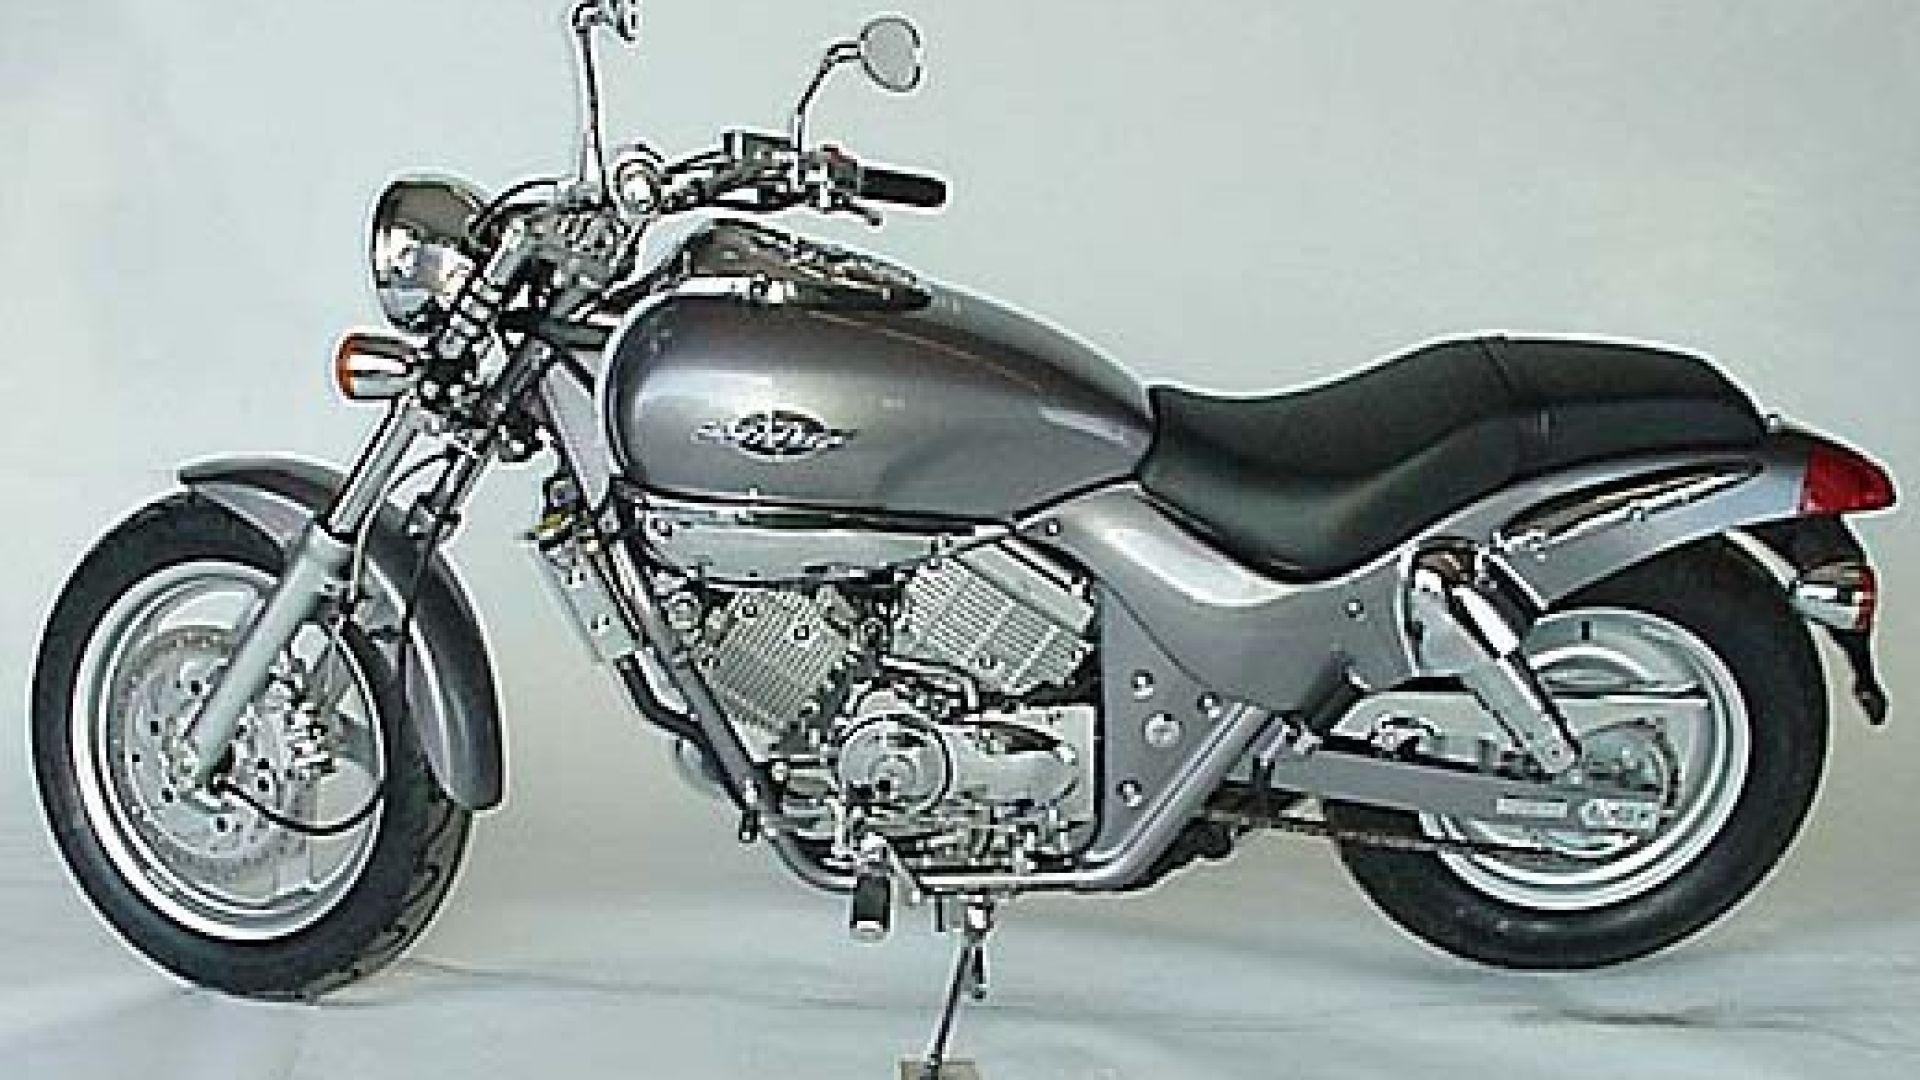 kymco venox 250 - motorbox